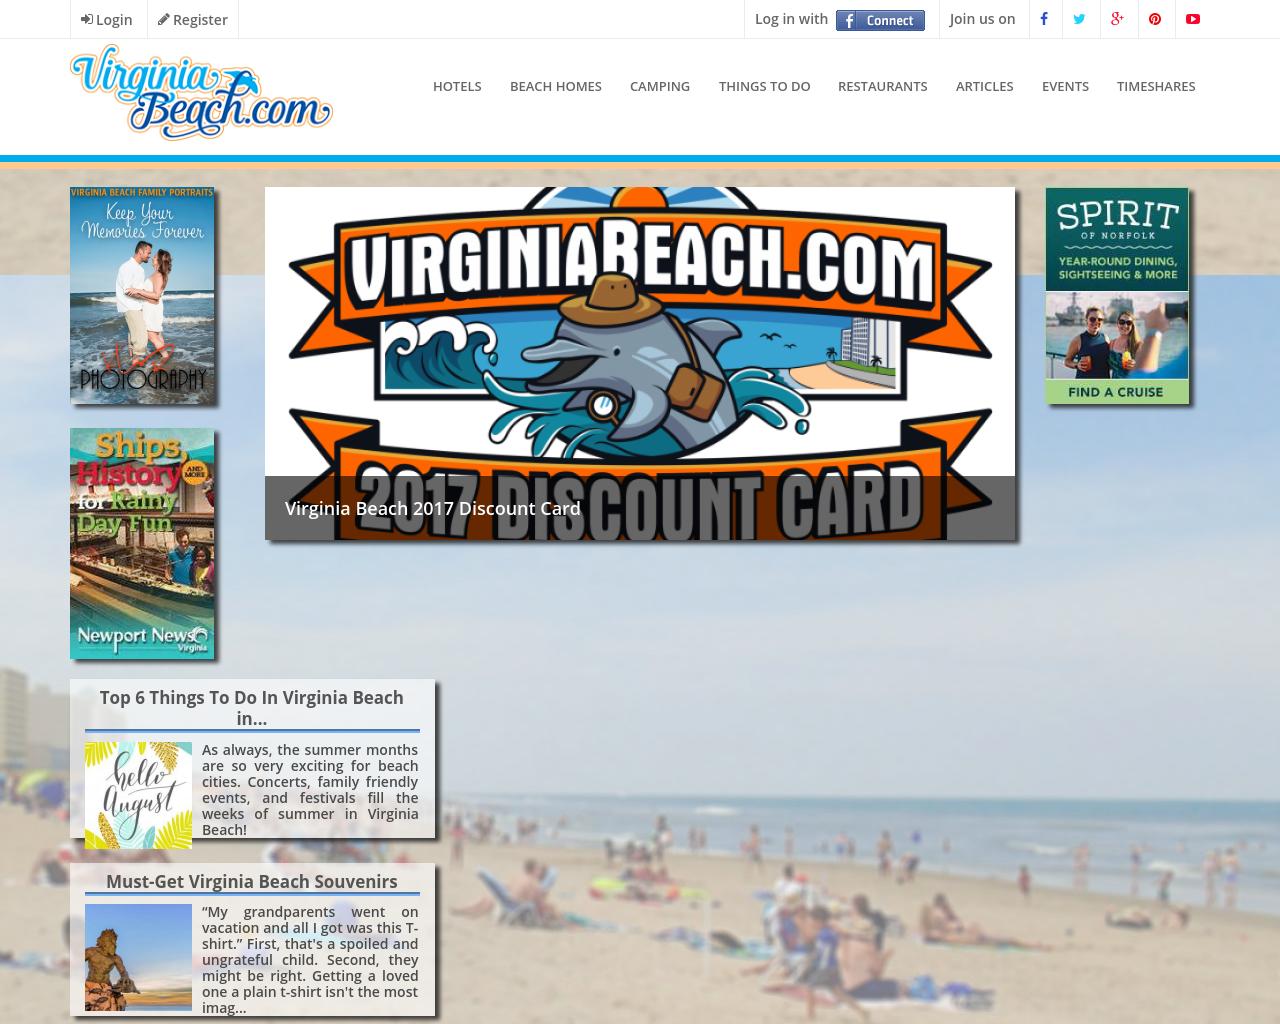 VirginiaBeach.com-Advertising-Reviews-Pricing